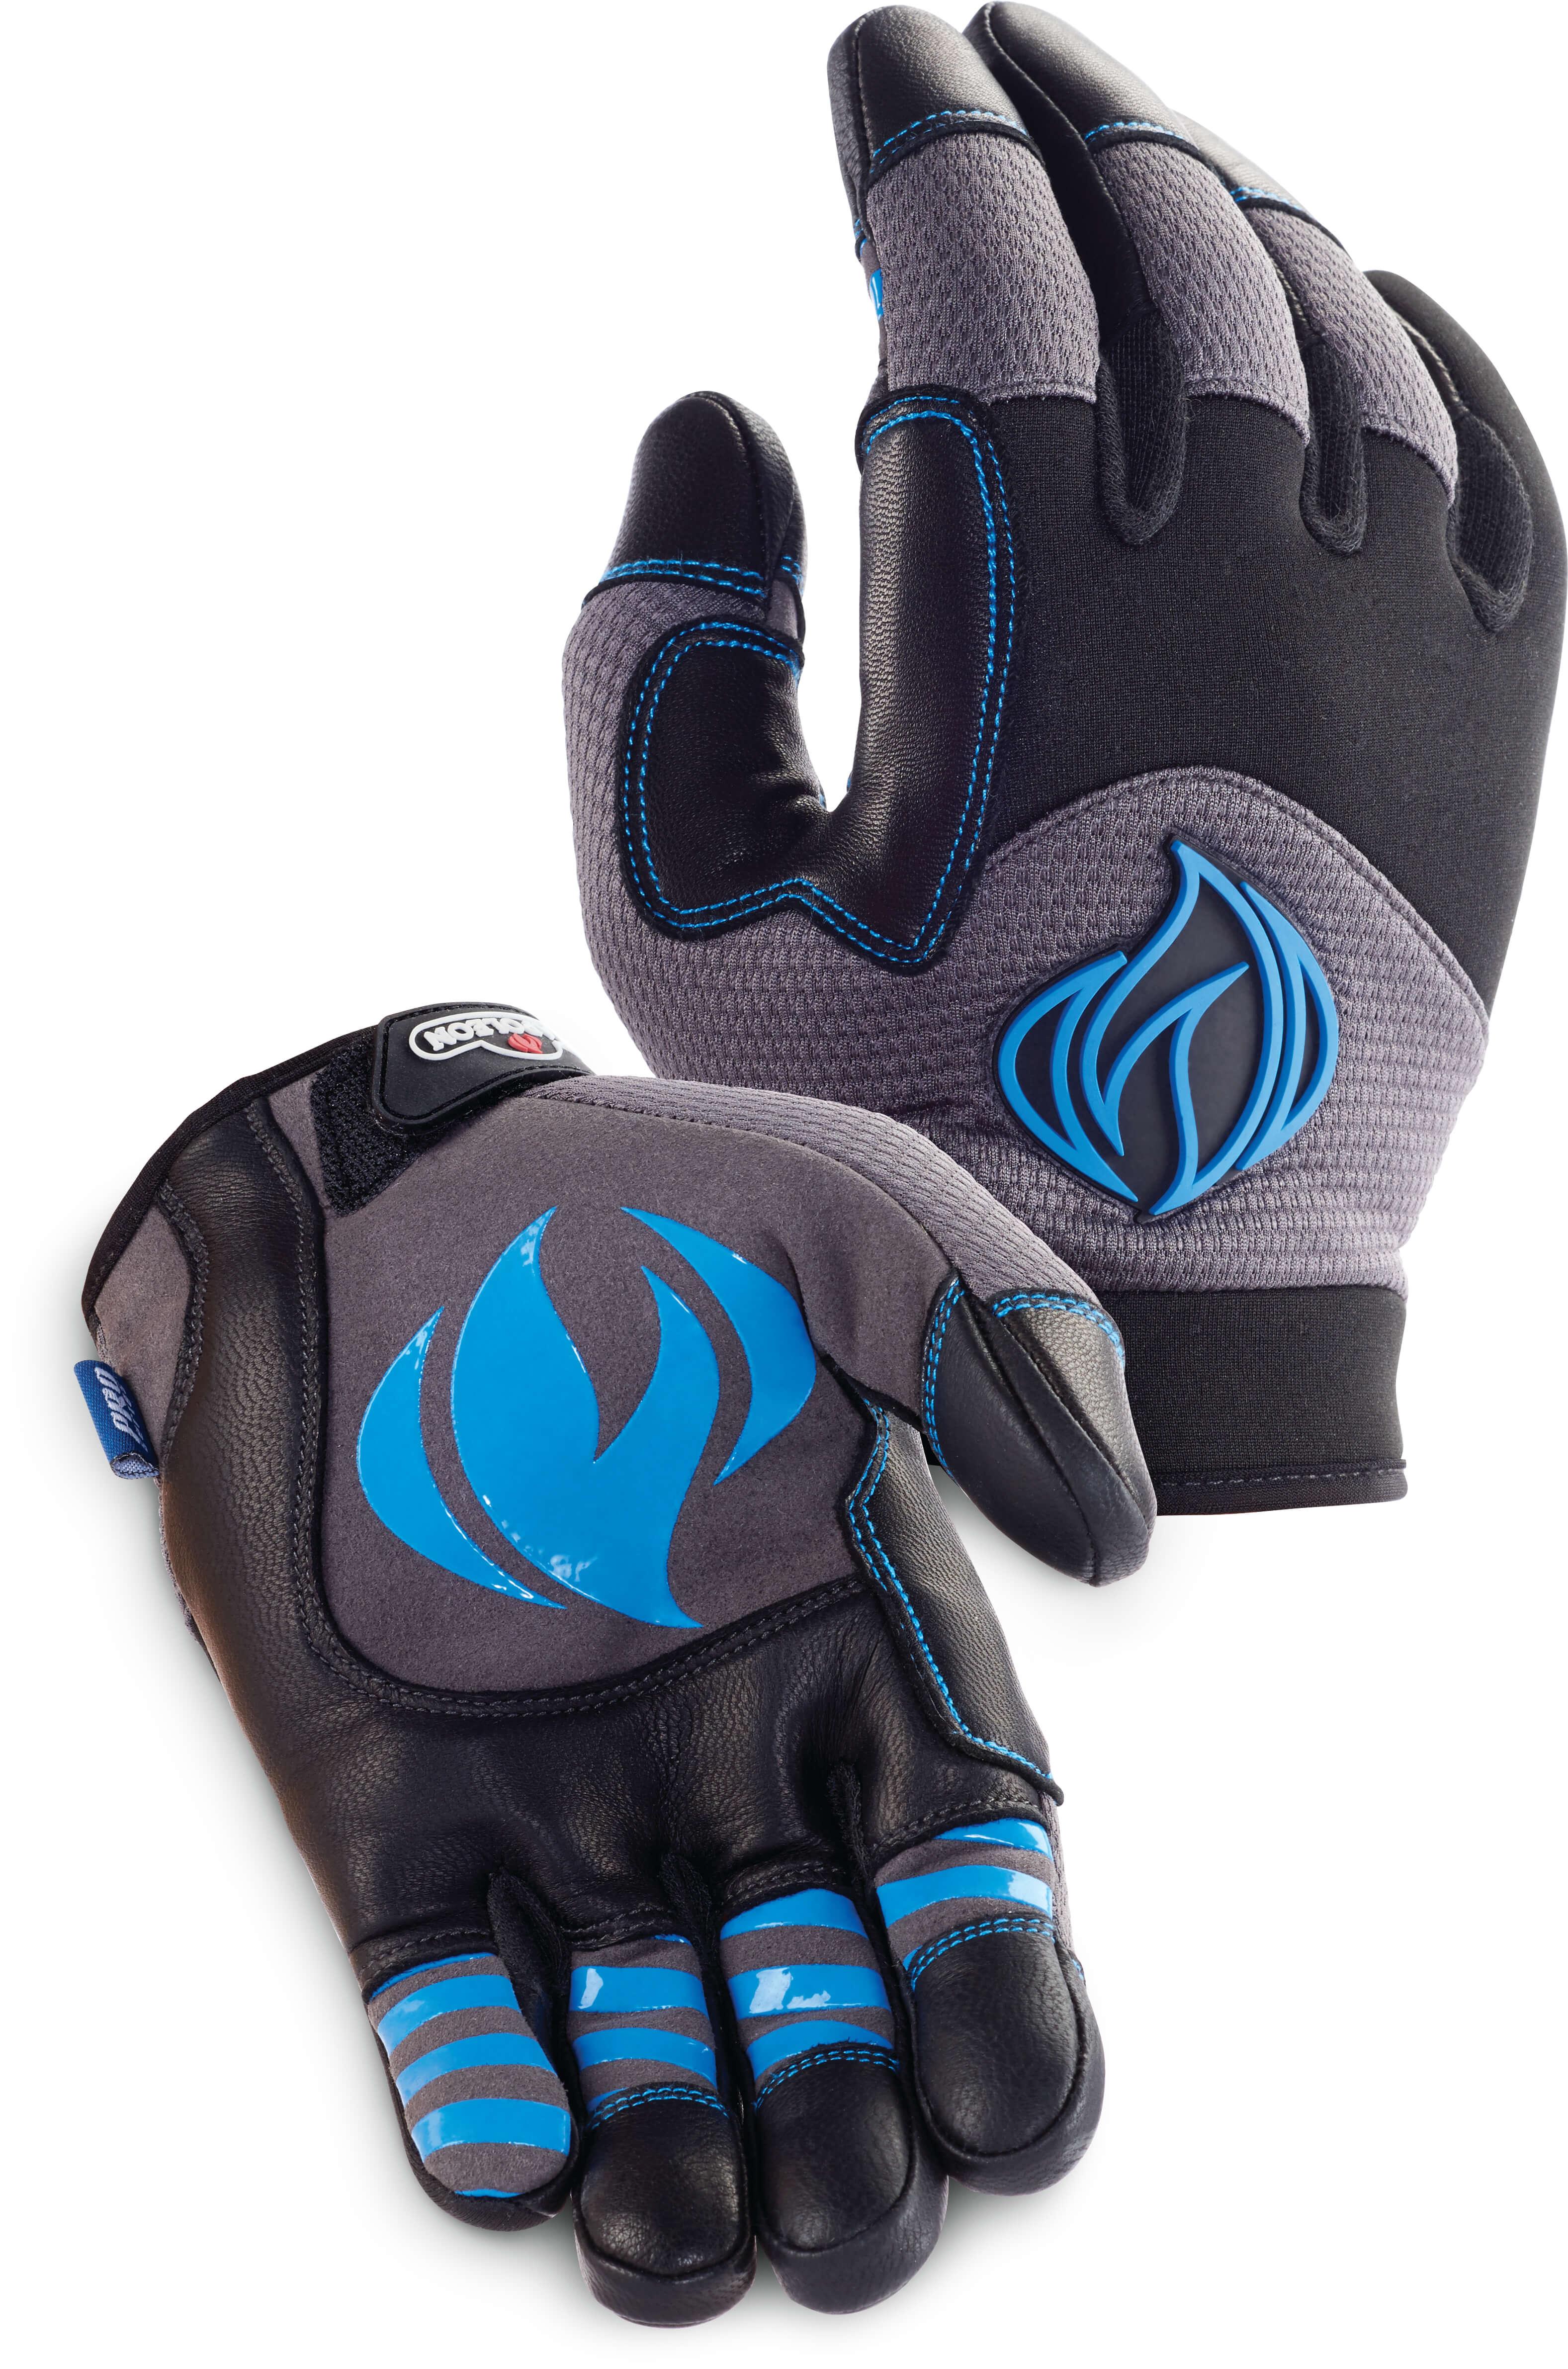 Multi-Use Touchscreen Gloves (XL / XXL)